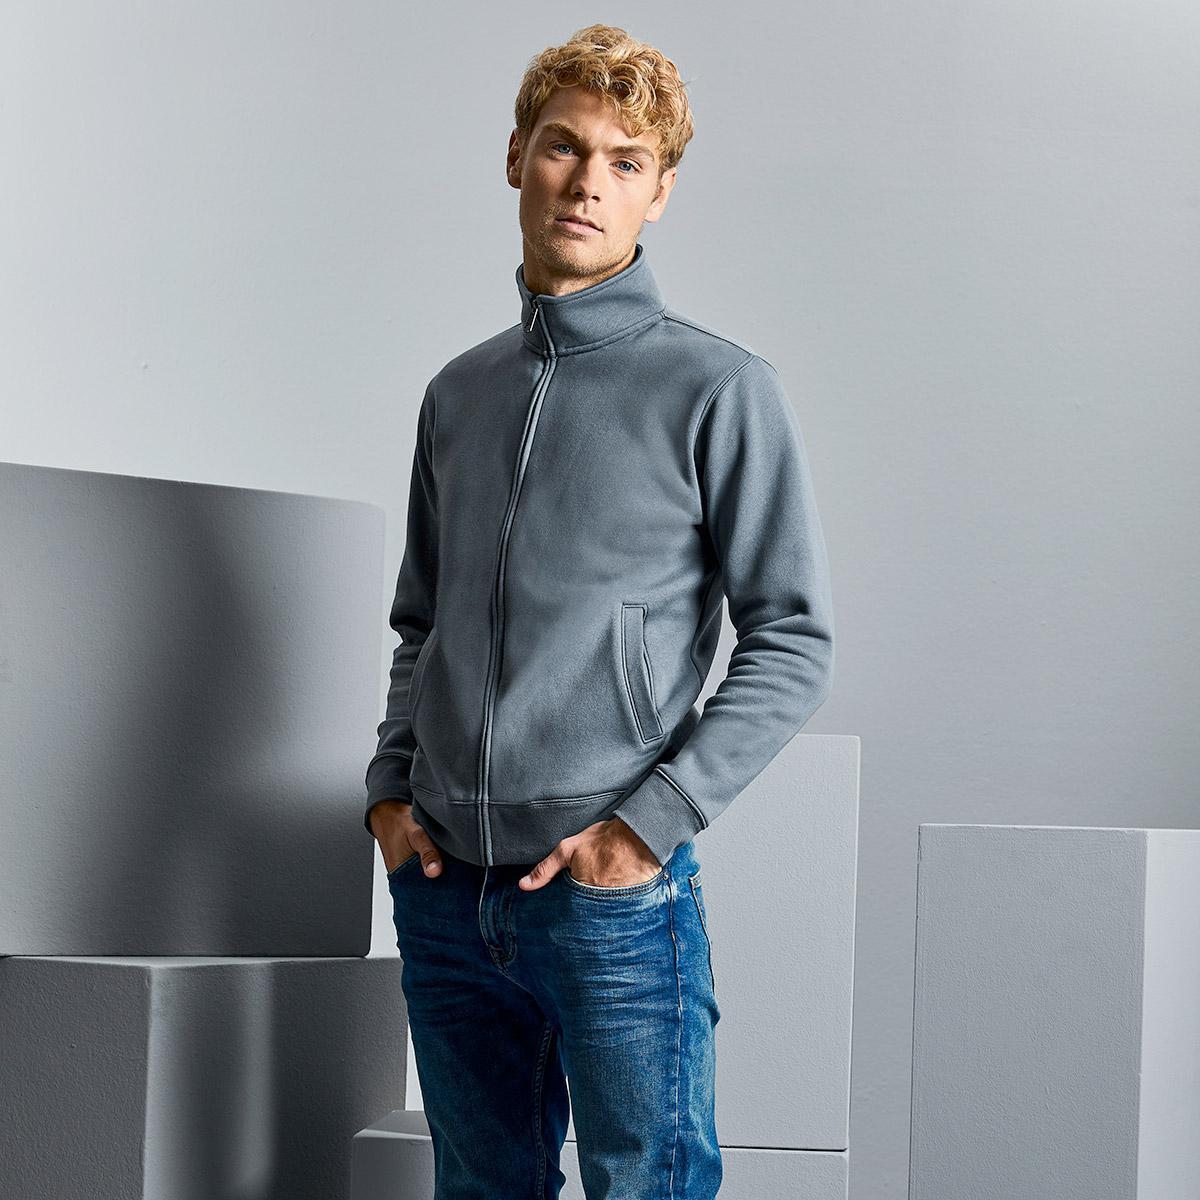 felpe zip jacket uomo personalizzate